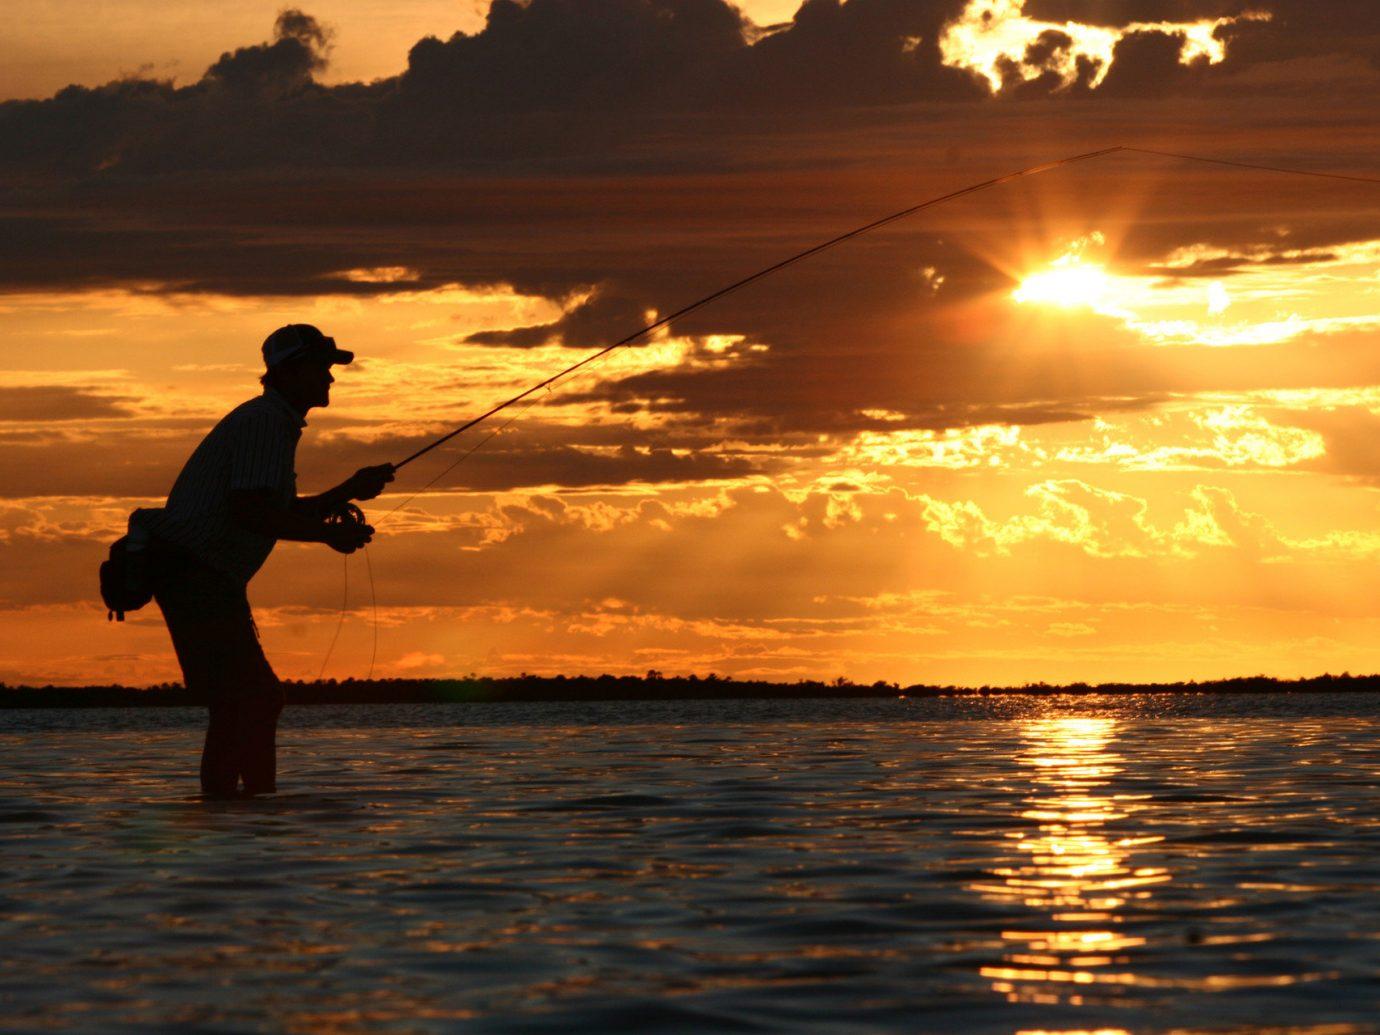 Trip Ideas water outdoor sky Sunset horizon Sea fishing cloud morning evening dusk sunrise Ocean sunlight dawn silhouette